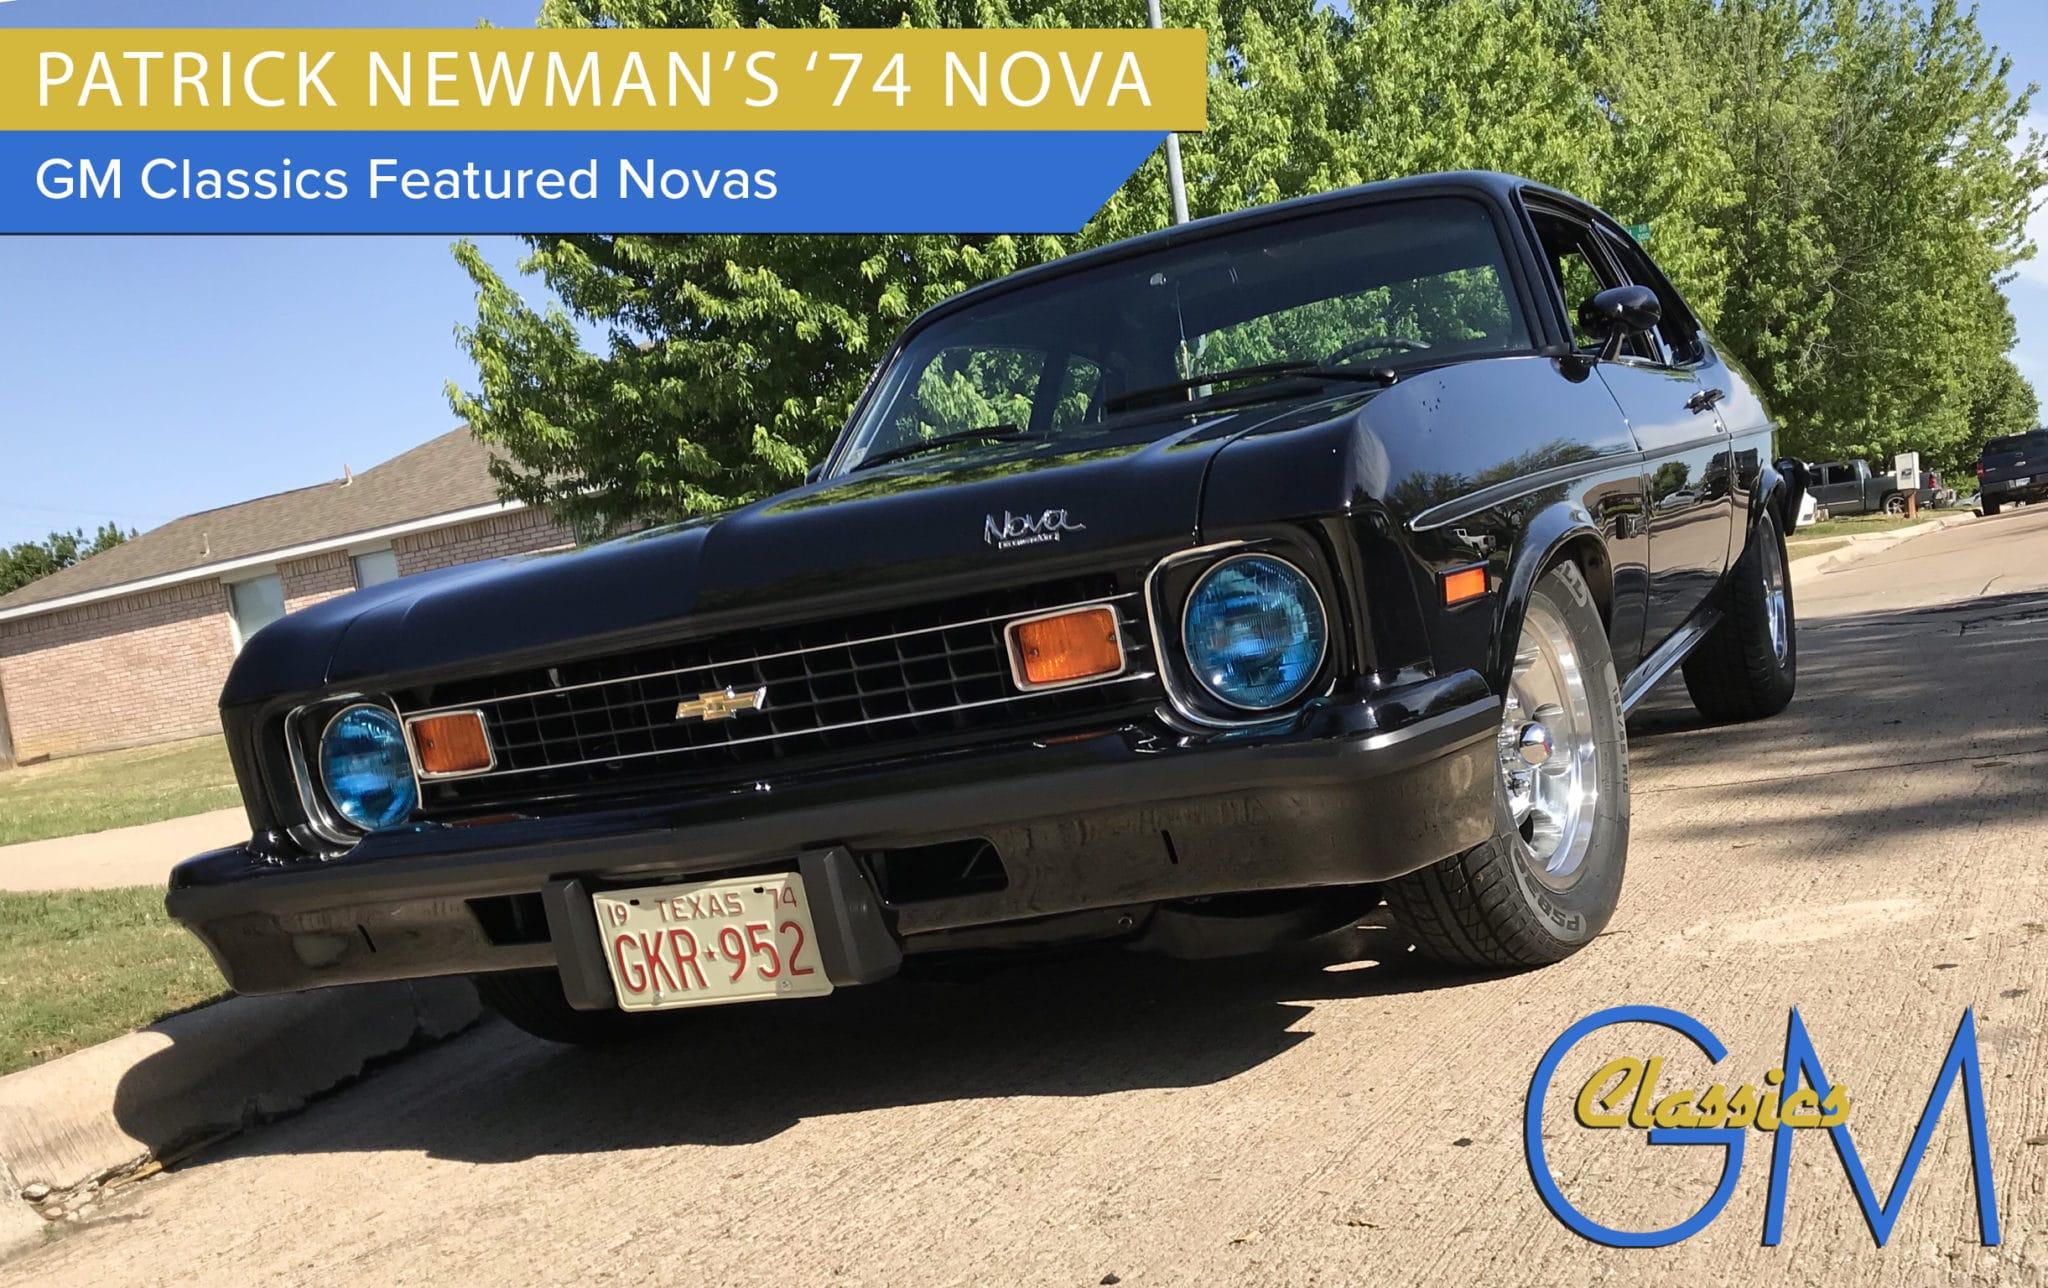 Patrick Newman's 1974 Nova